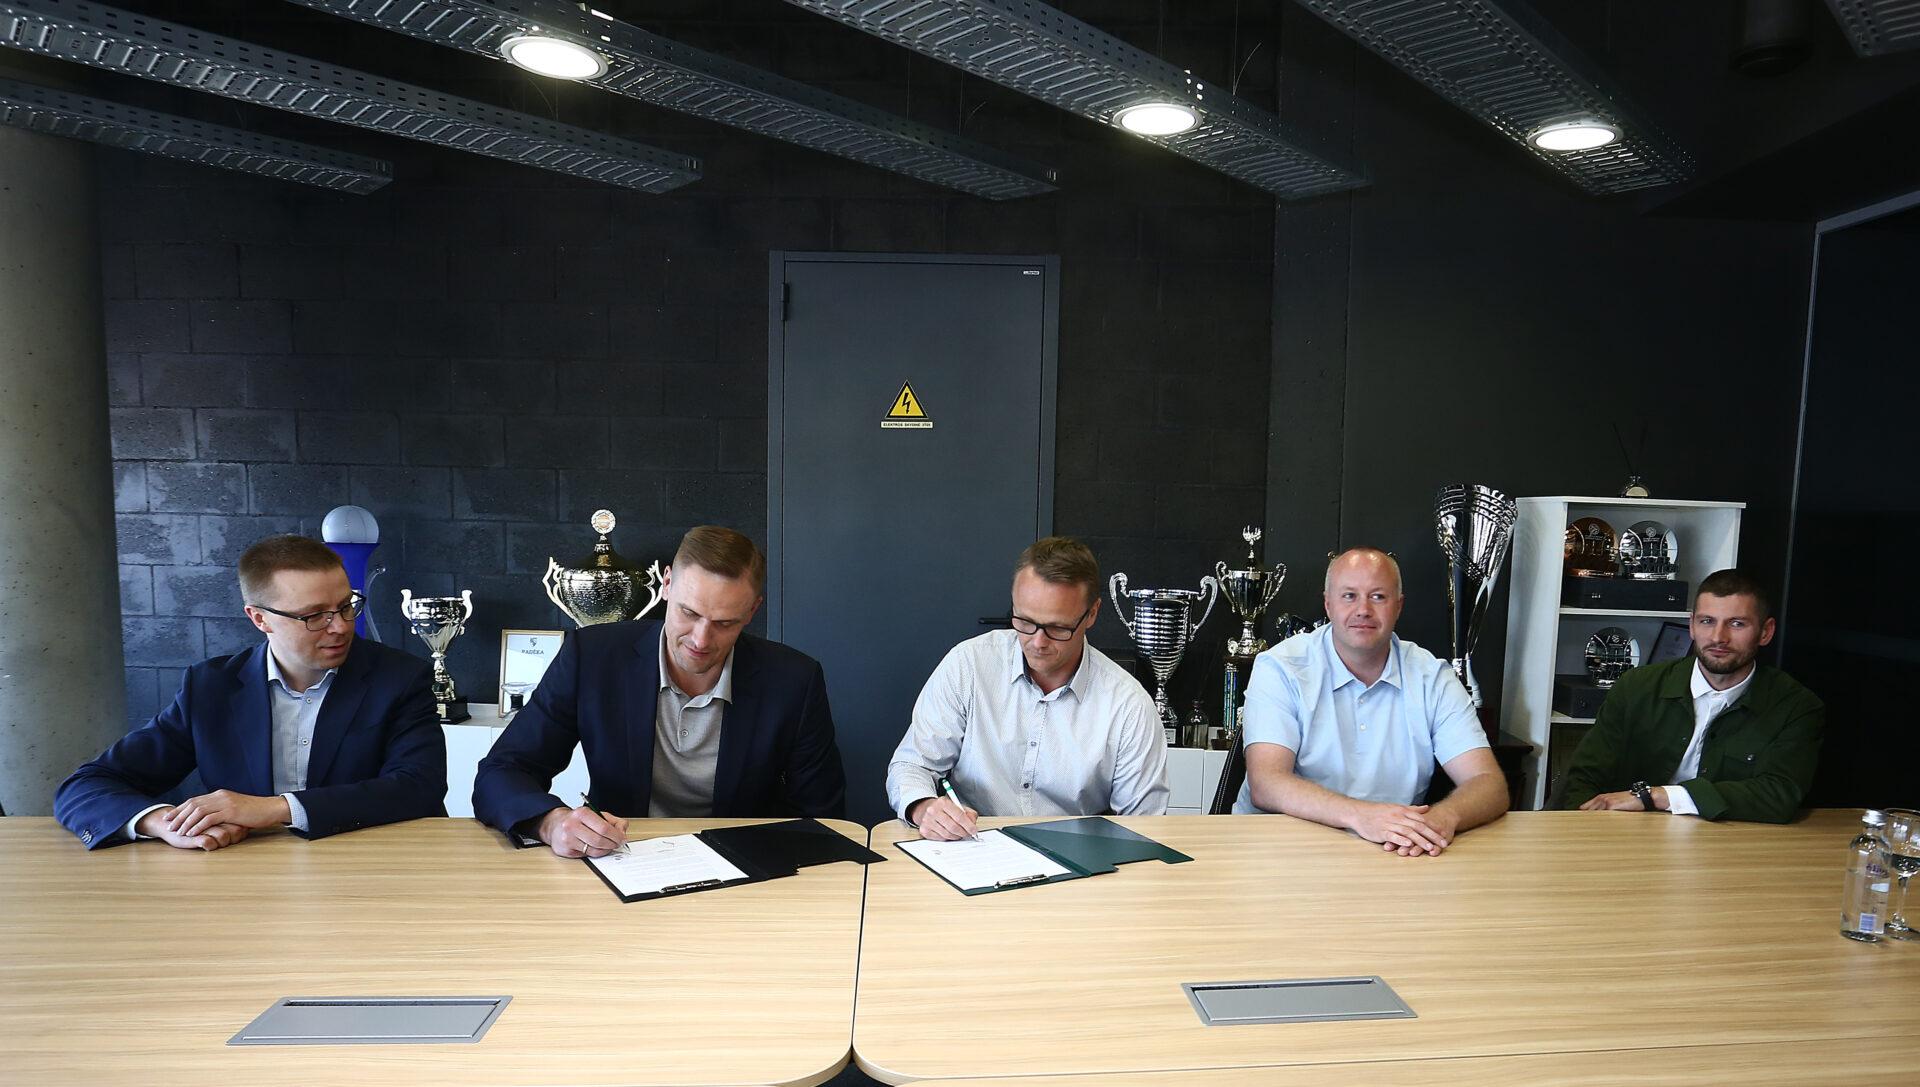 Sportsakademiet på Stenhus Gymnasium indleder samarbejde med Zalgiris